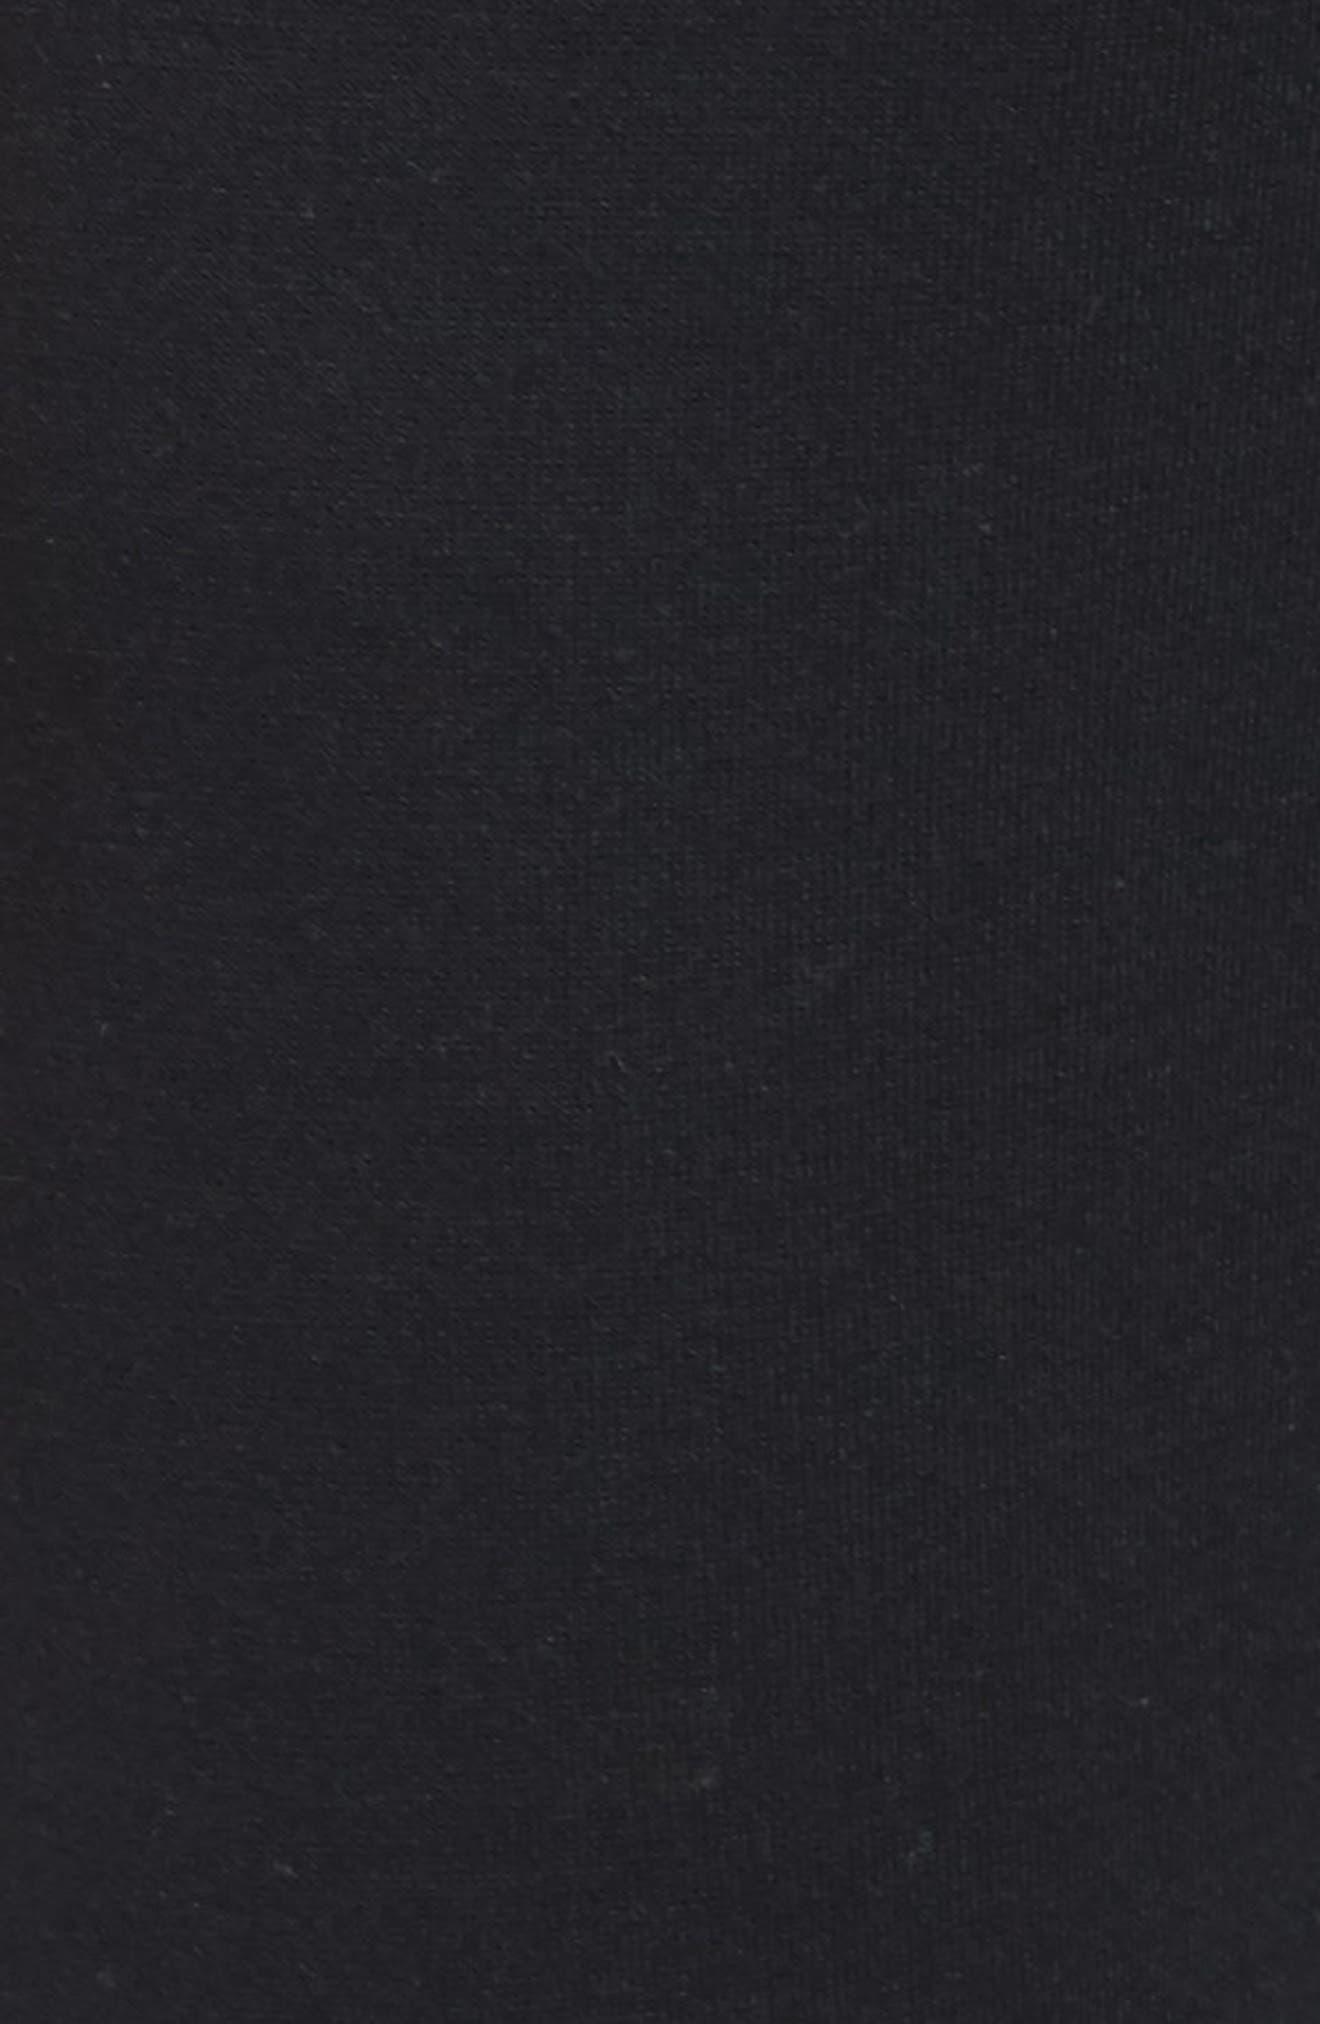 Colorblock Sweatpants,                             Alternate thumbnail 5, color,                             BLACK